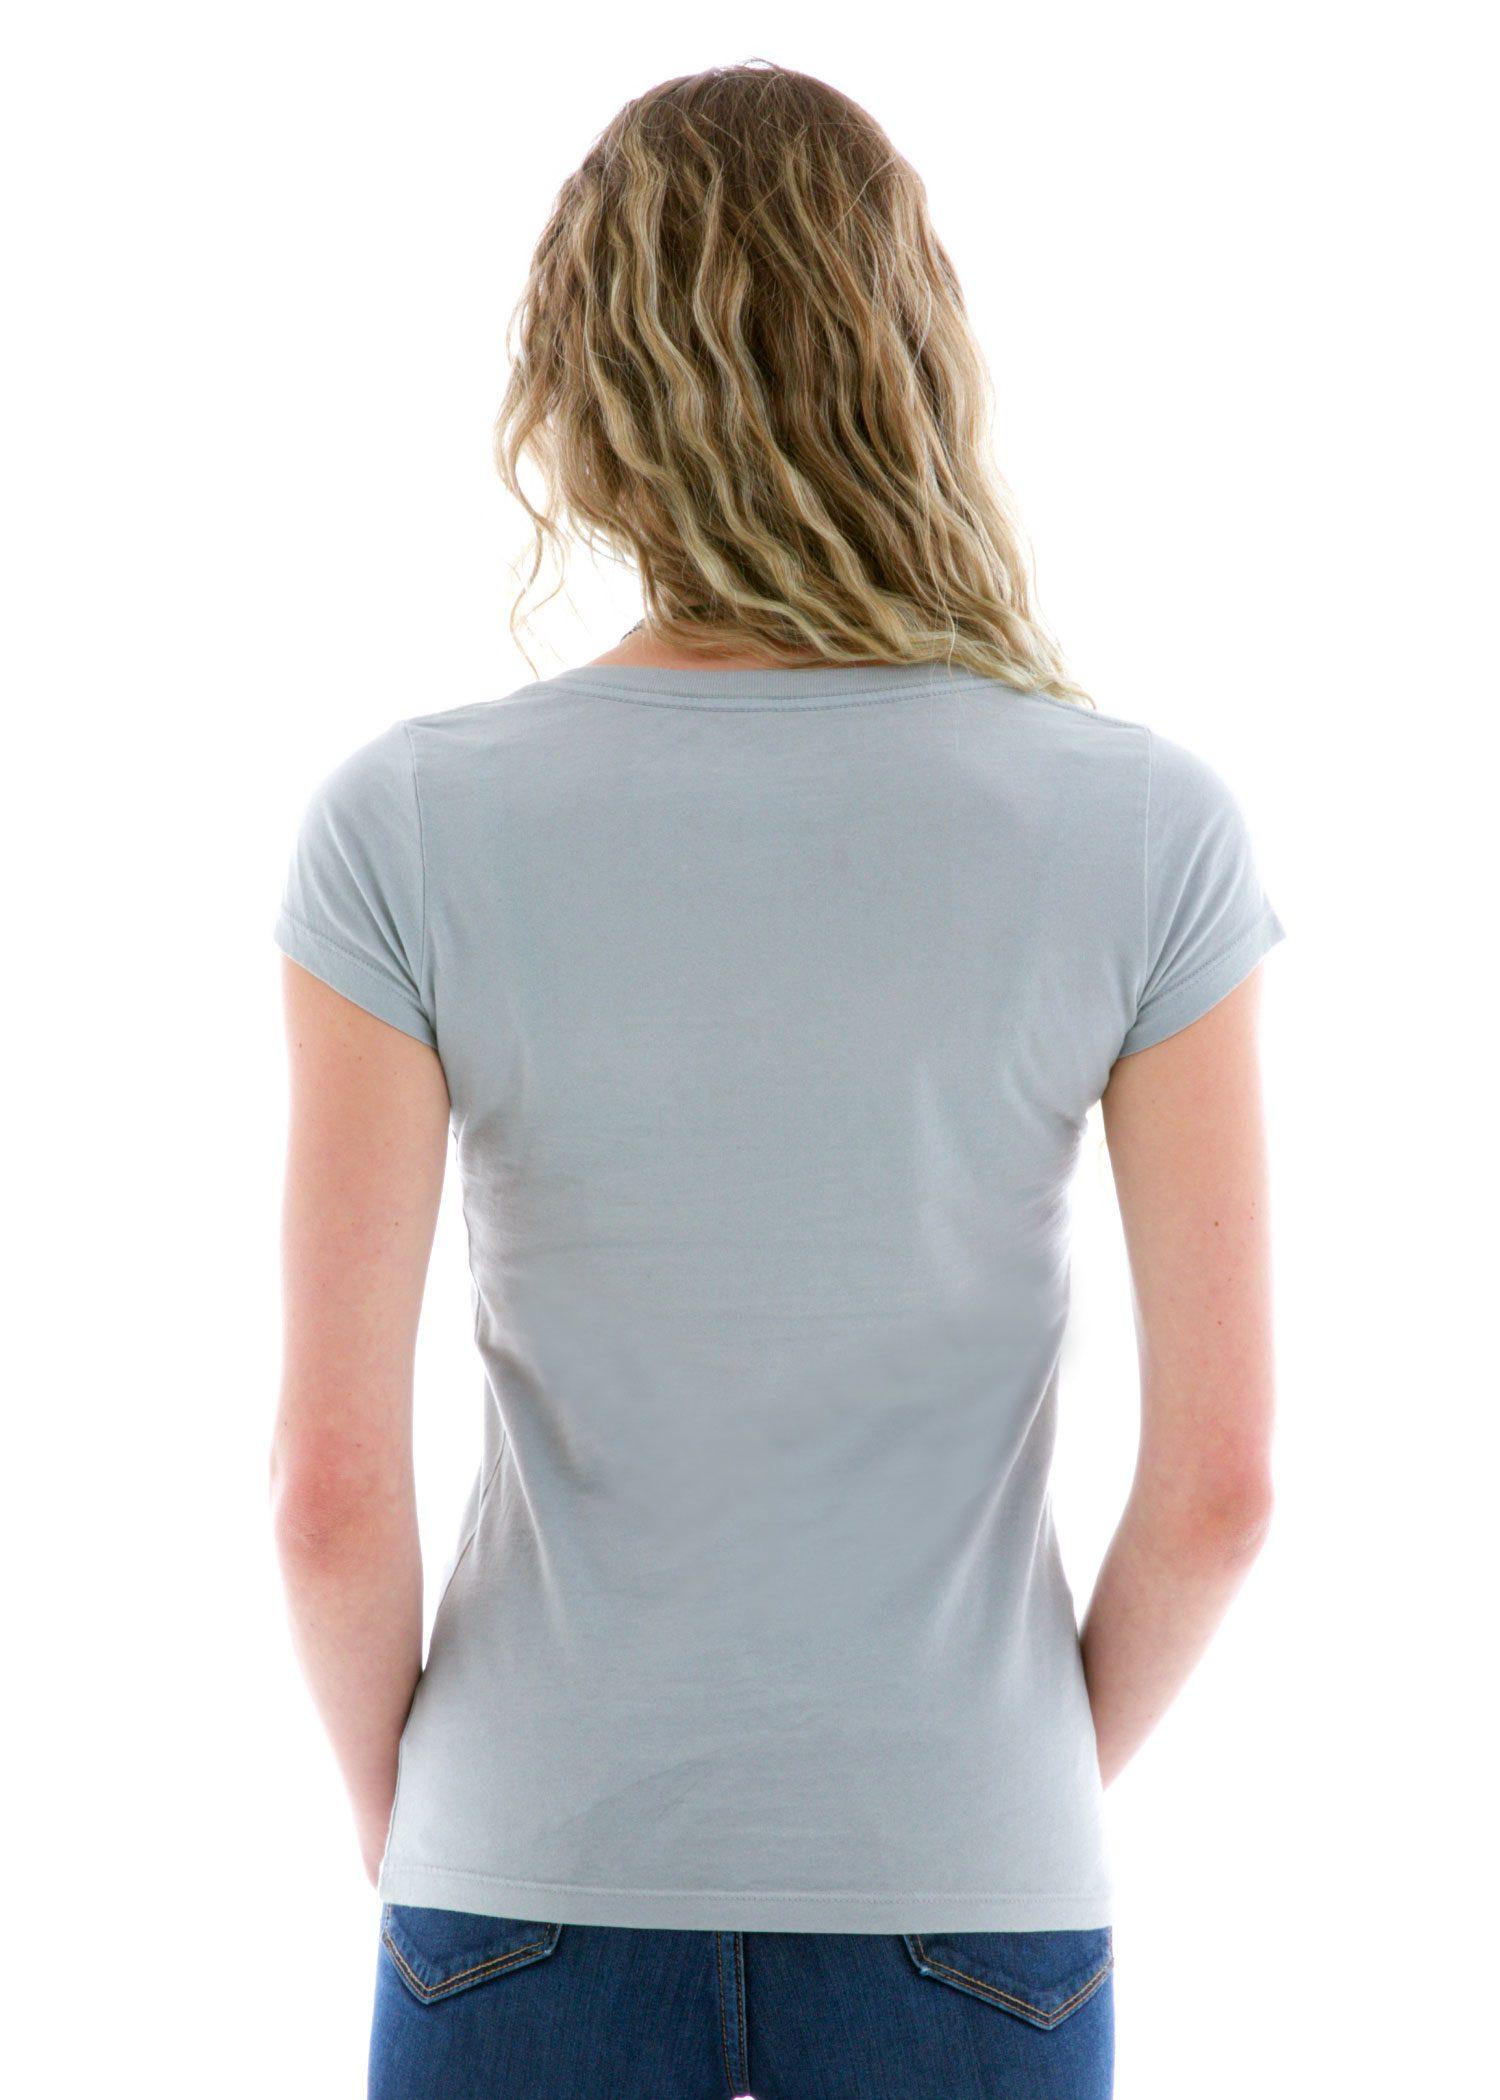 Premium Shallow V-neck Short Sleeve T-Shirt Back View